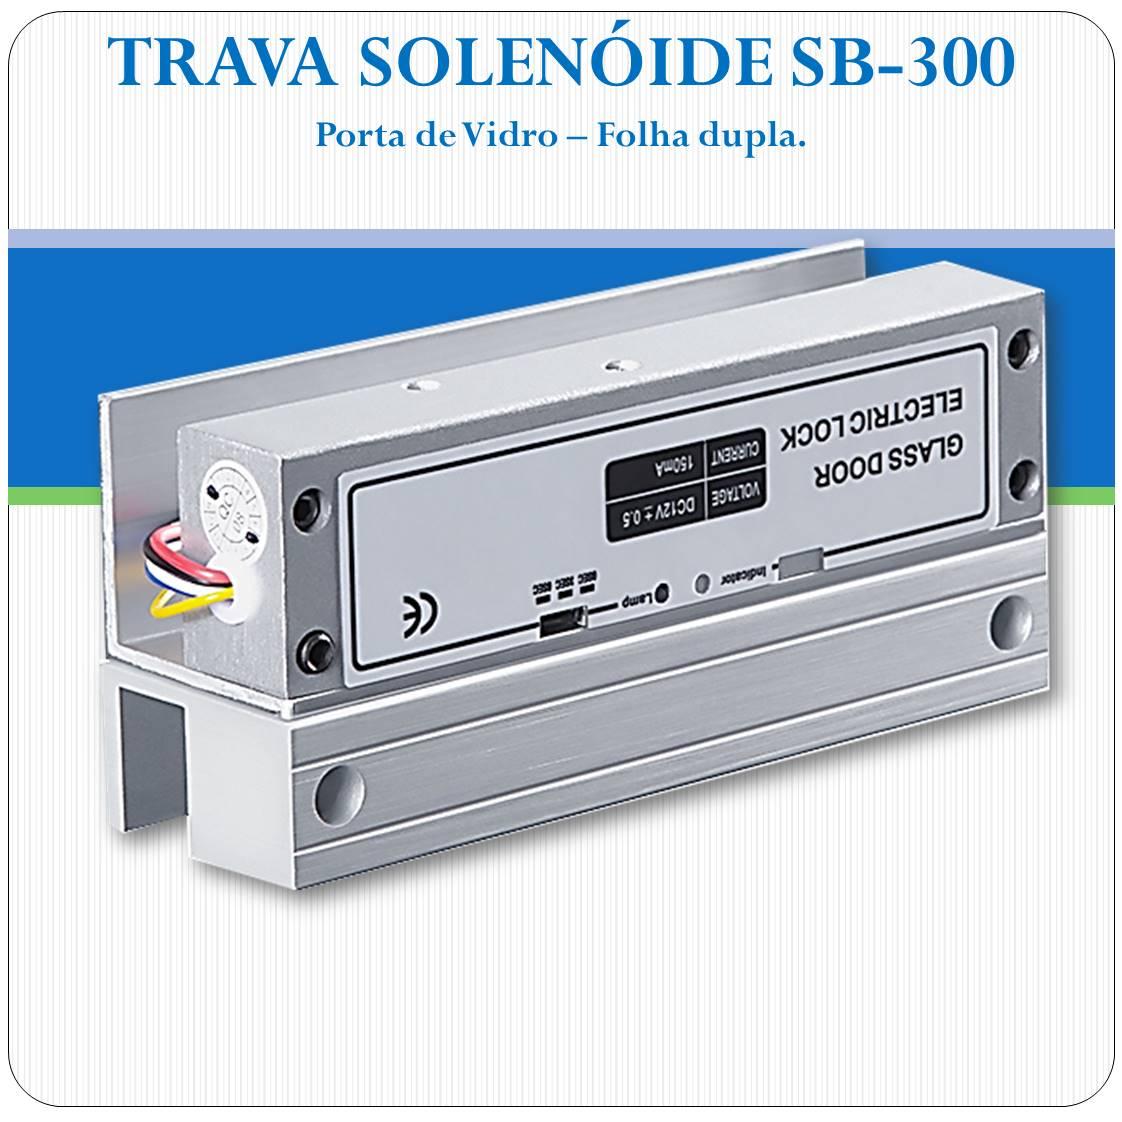 Trava elétrica Solenoide 12V para Portas de Vidro - SB300